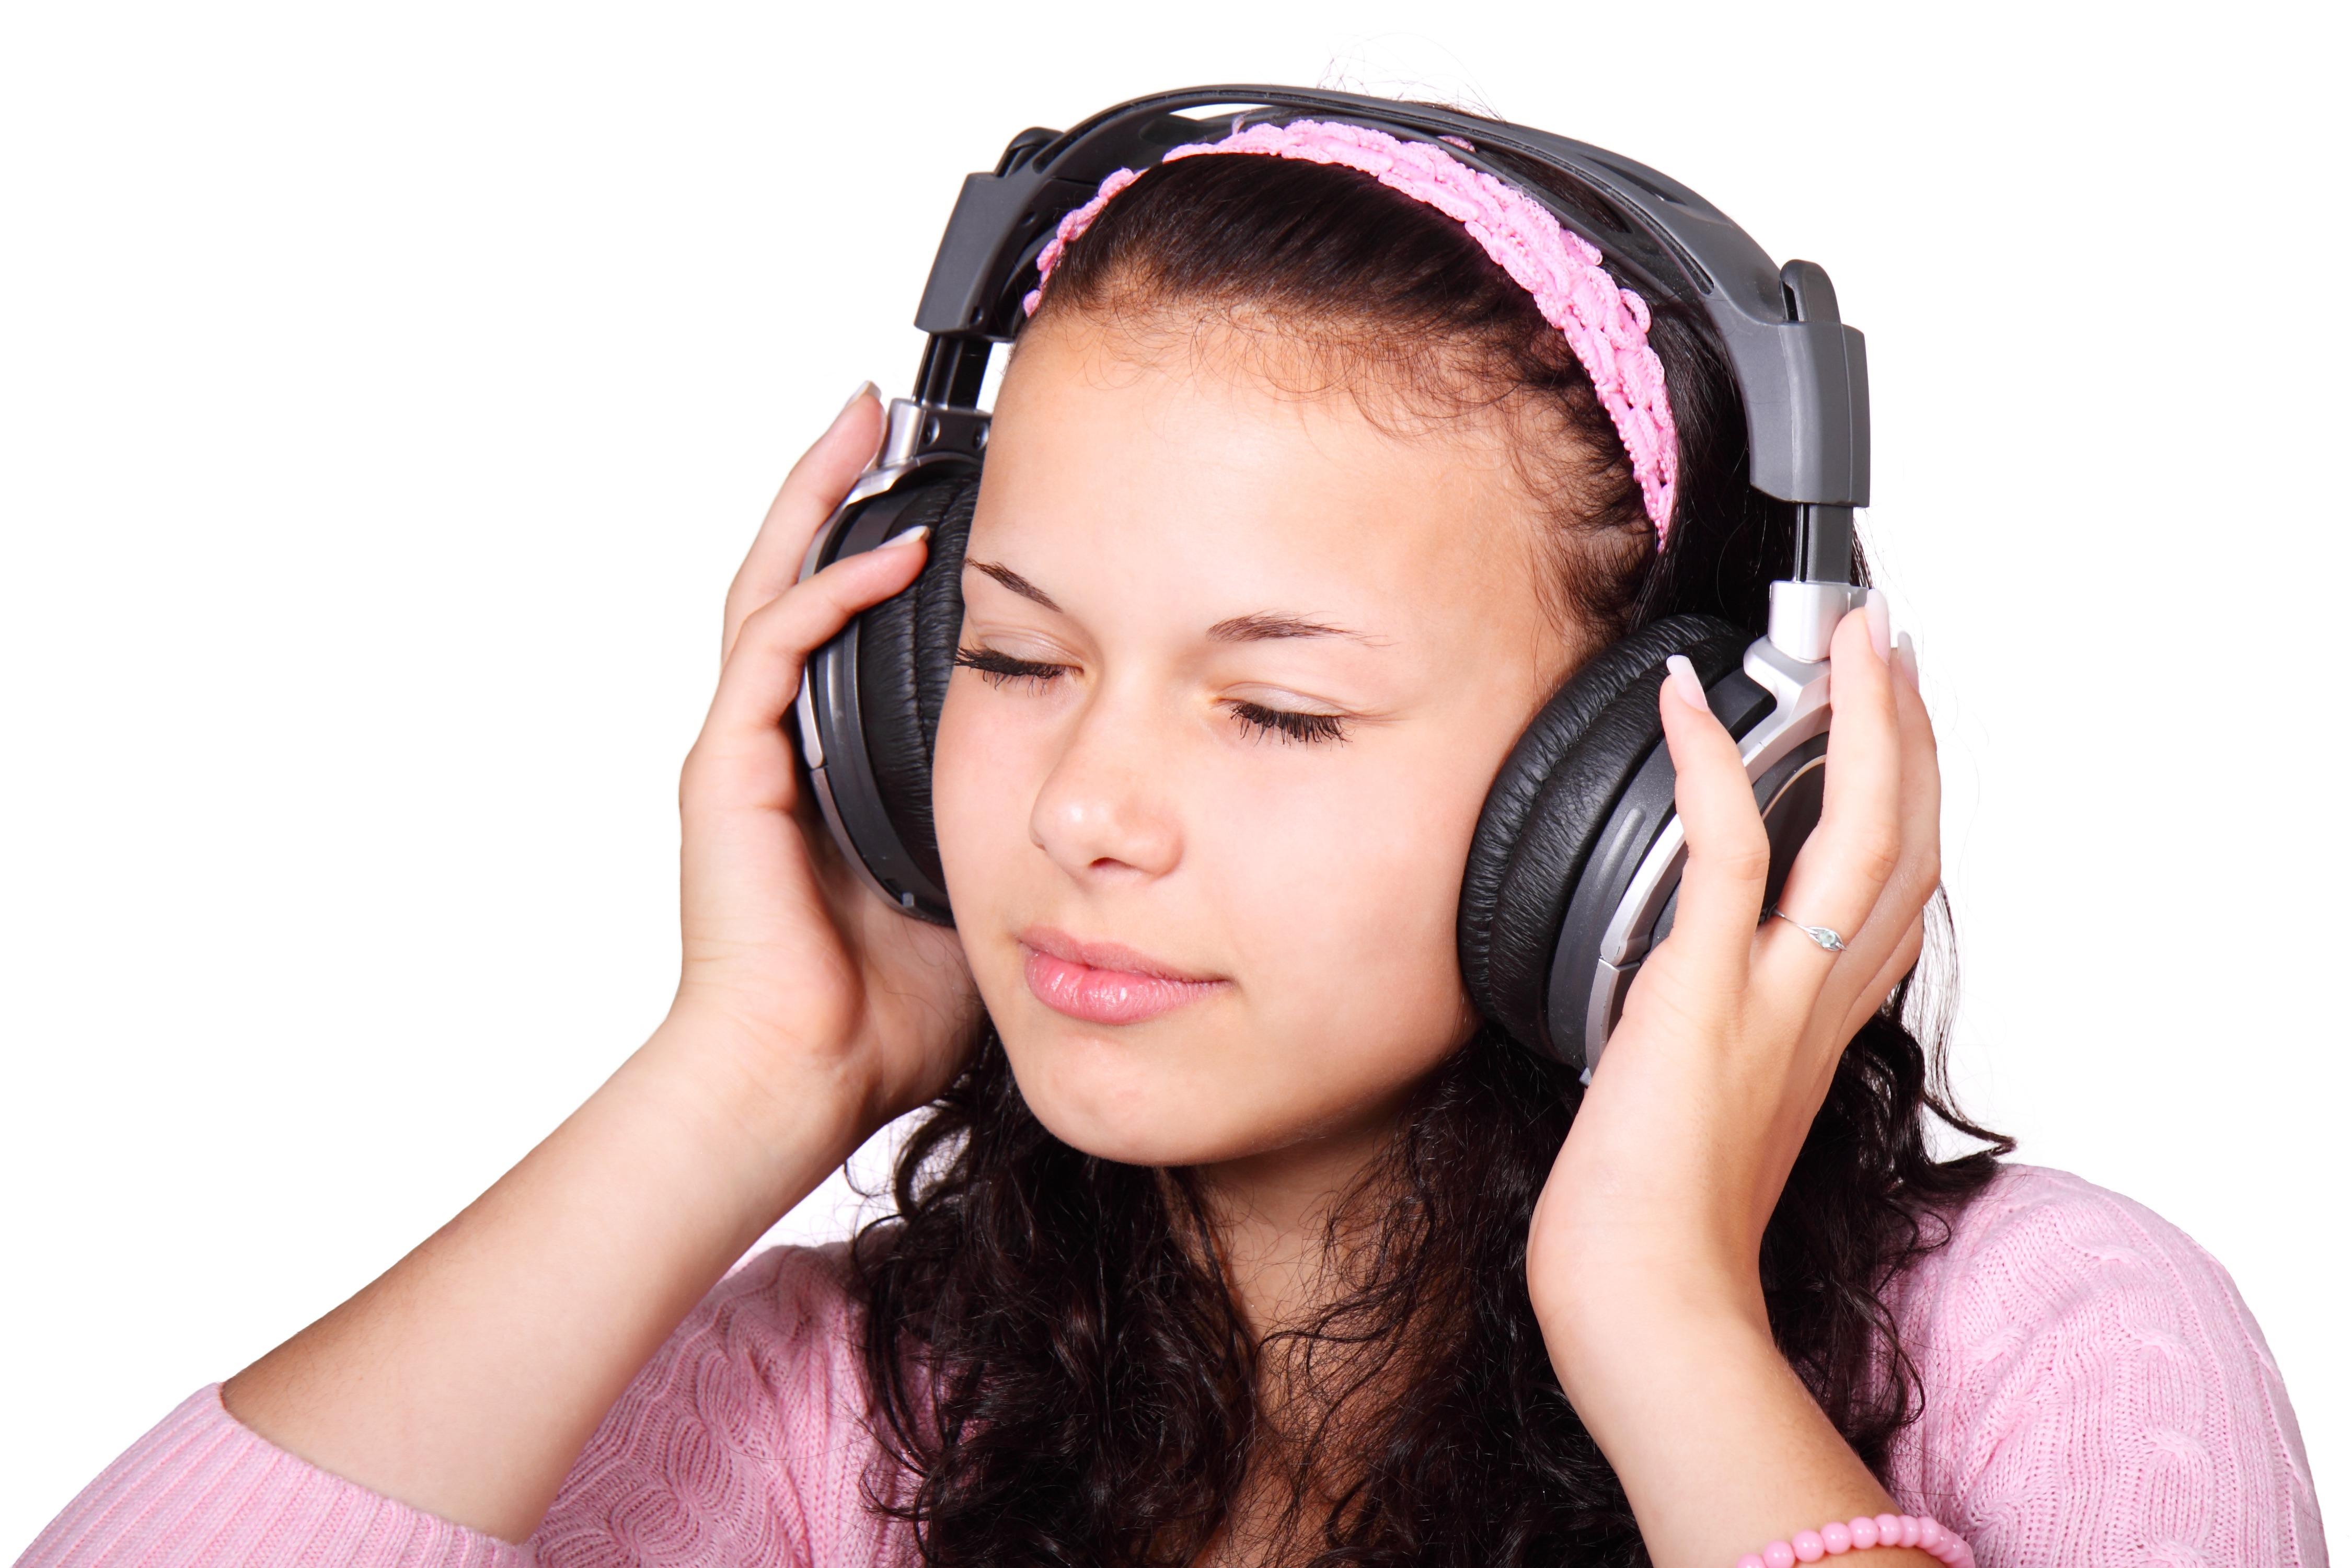 listening_to_music_187493.jpg